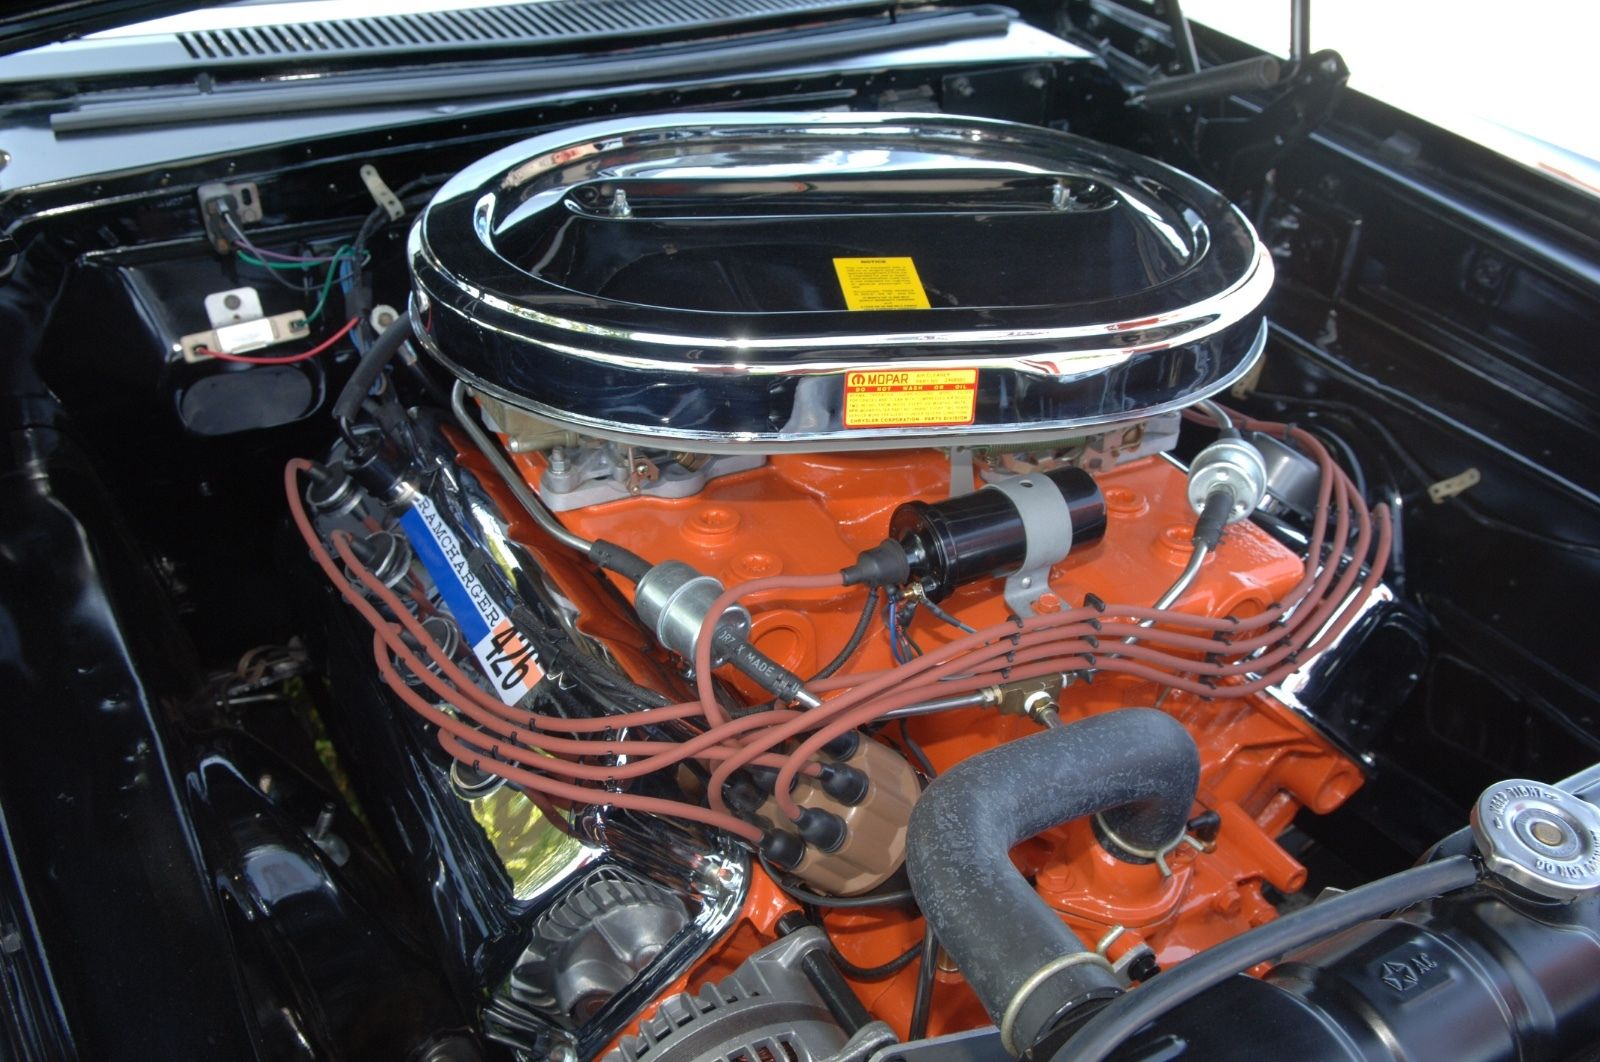 1965 426 Race Hemi Wo51 A990 Dodge Coronet Factory Light